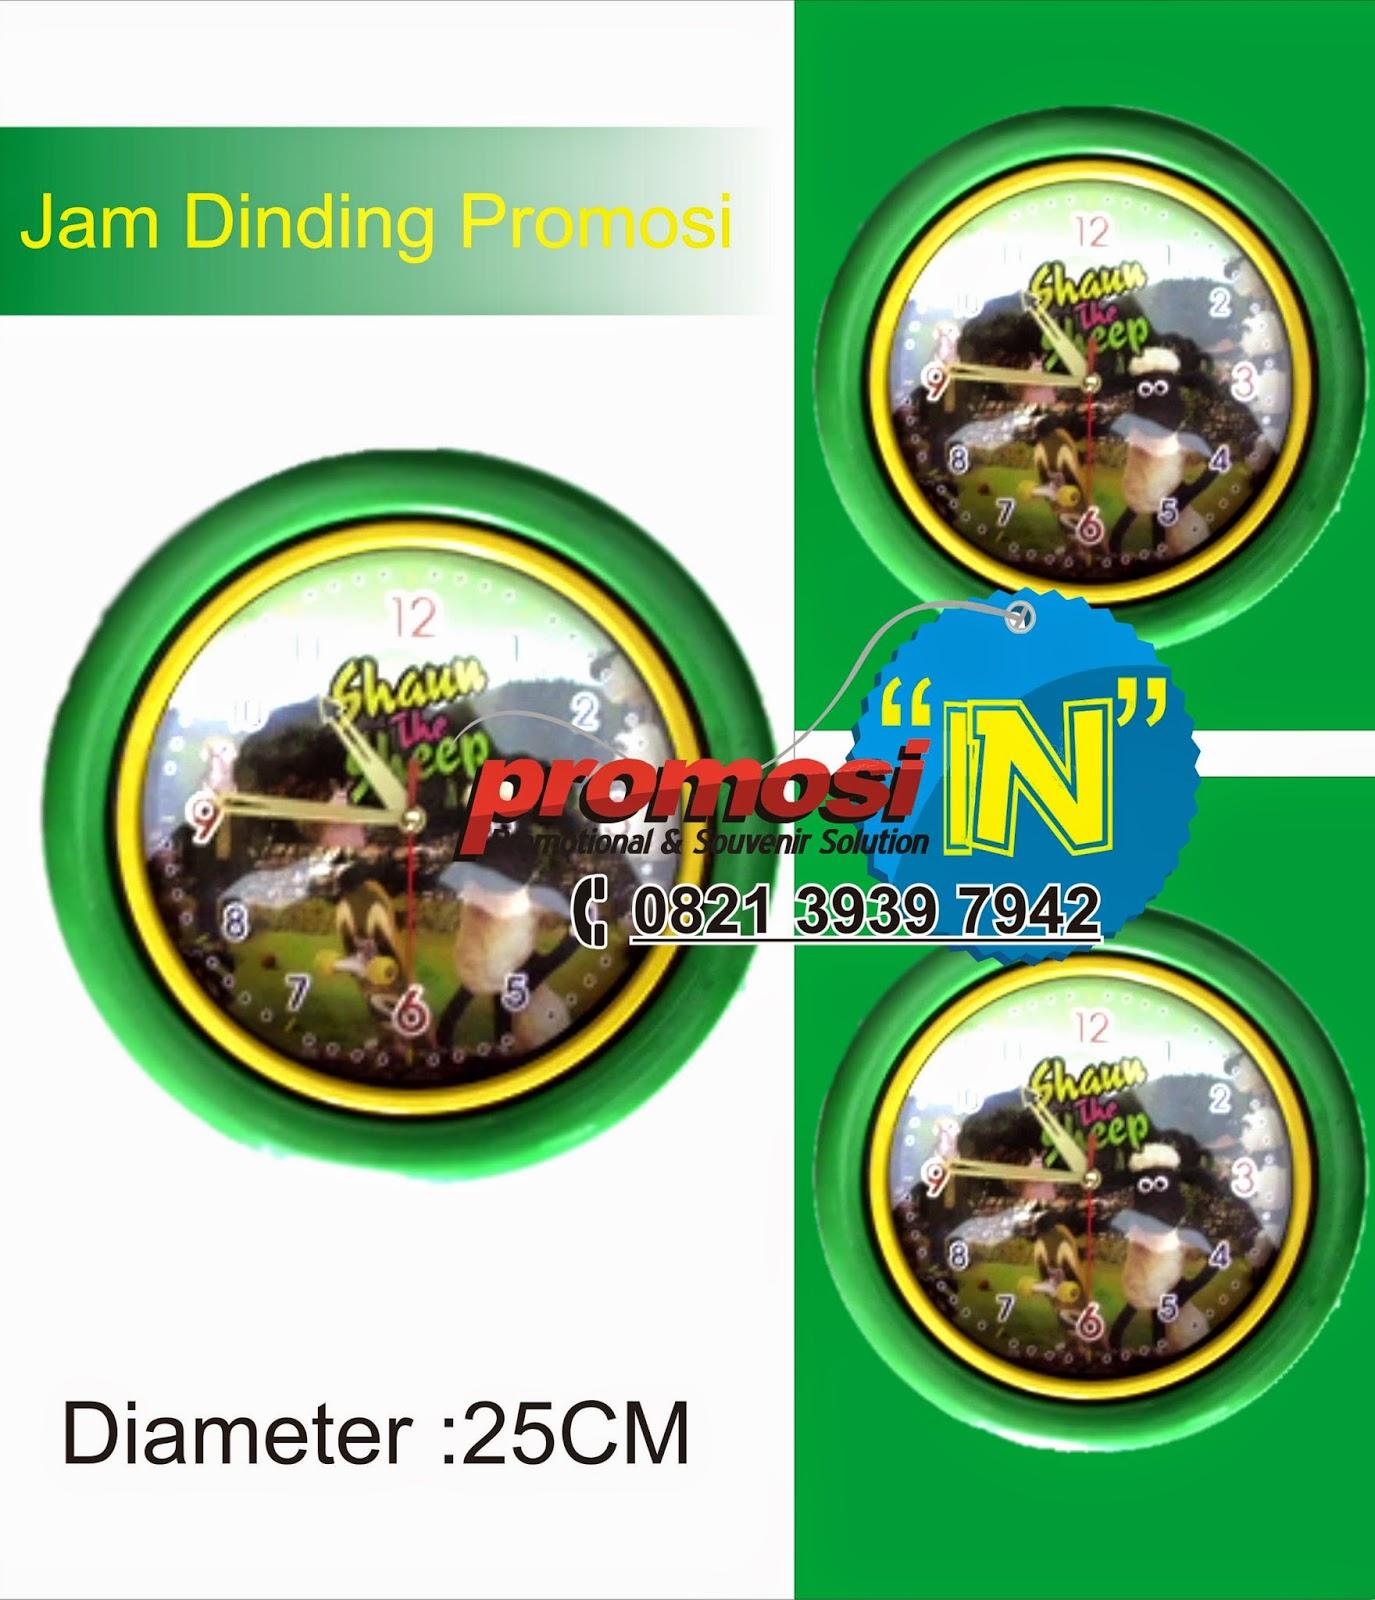 Jam Dinding, Jam Dinding Foto, Jam Dinding Desain Sendiri, Jam Dinding Online